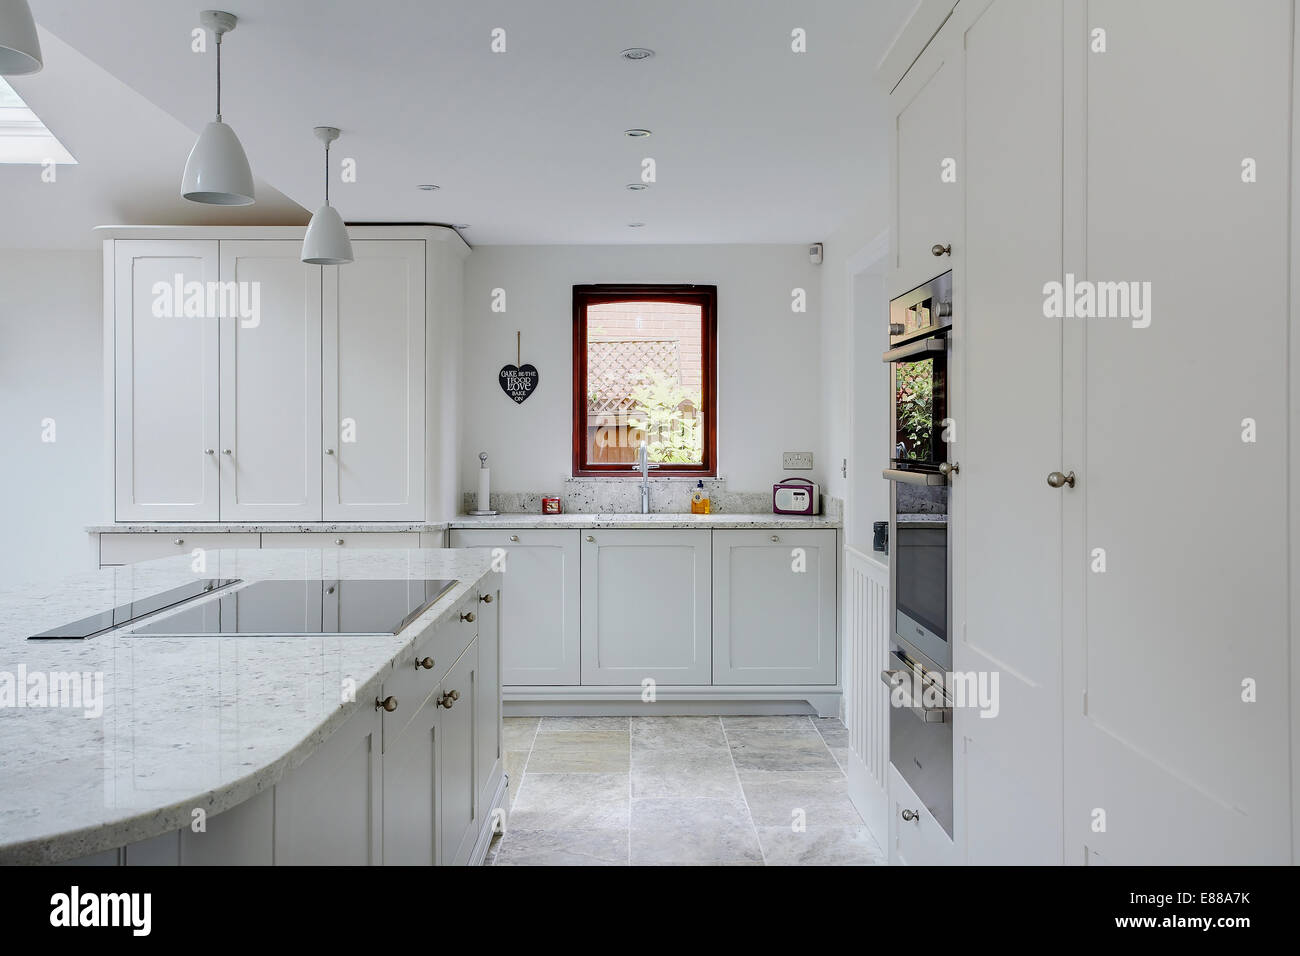 white kitchen granite worktops stockfotos white kitchen granite worktops bilder alamy. Black Bedroom Furniture Sets. Home Design Ideas